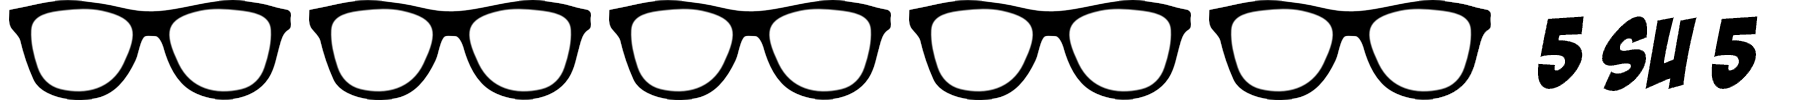 occhiali nerd 5 su 5